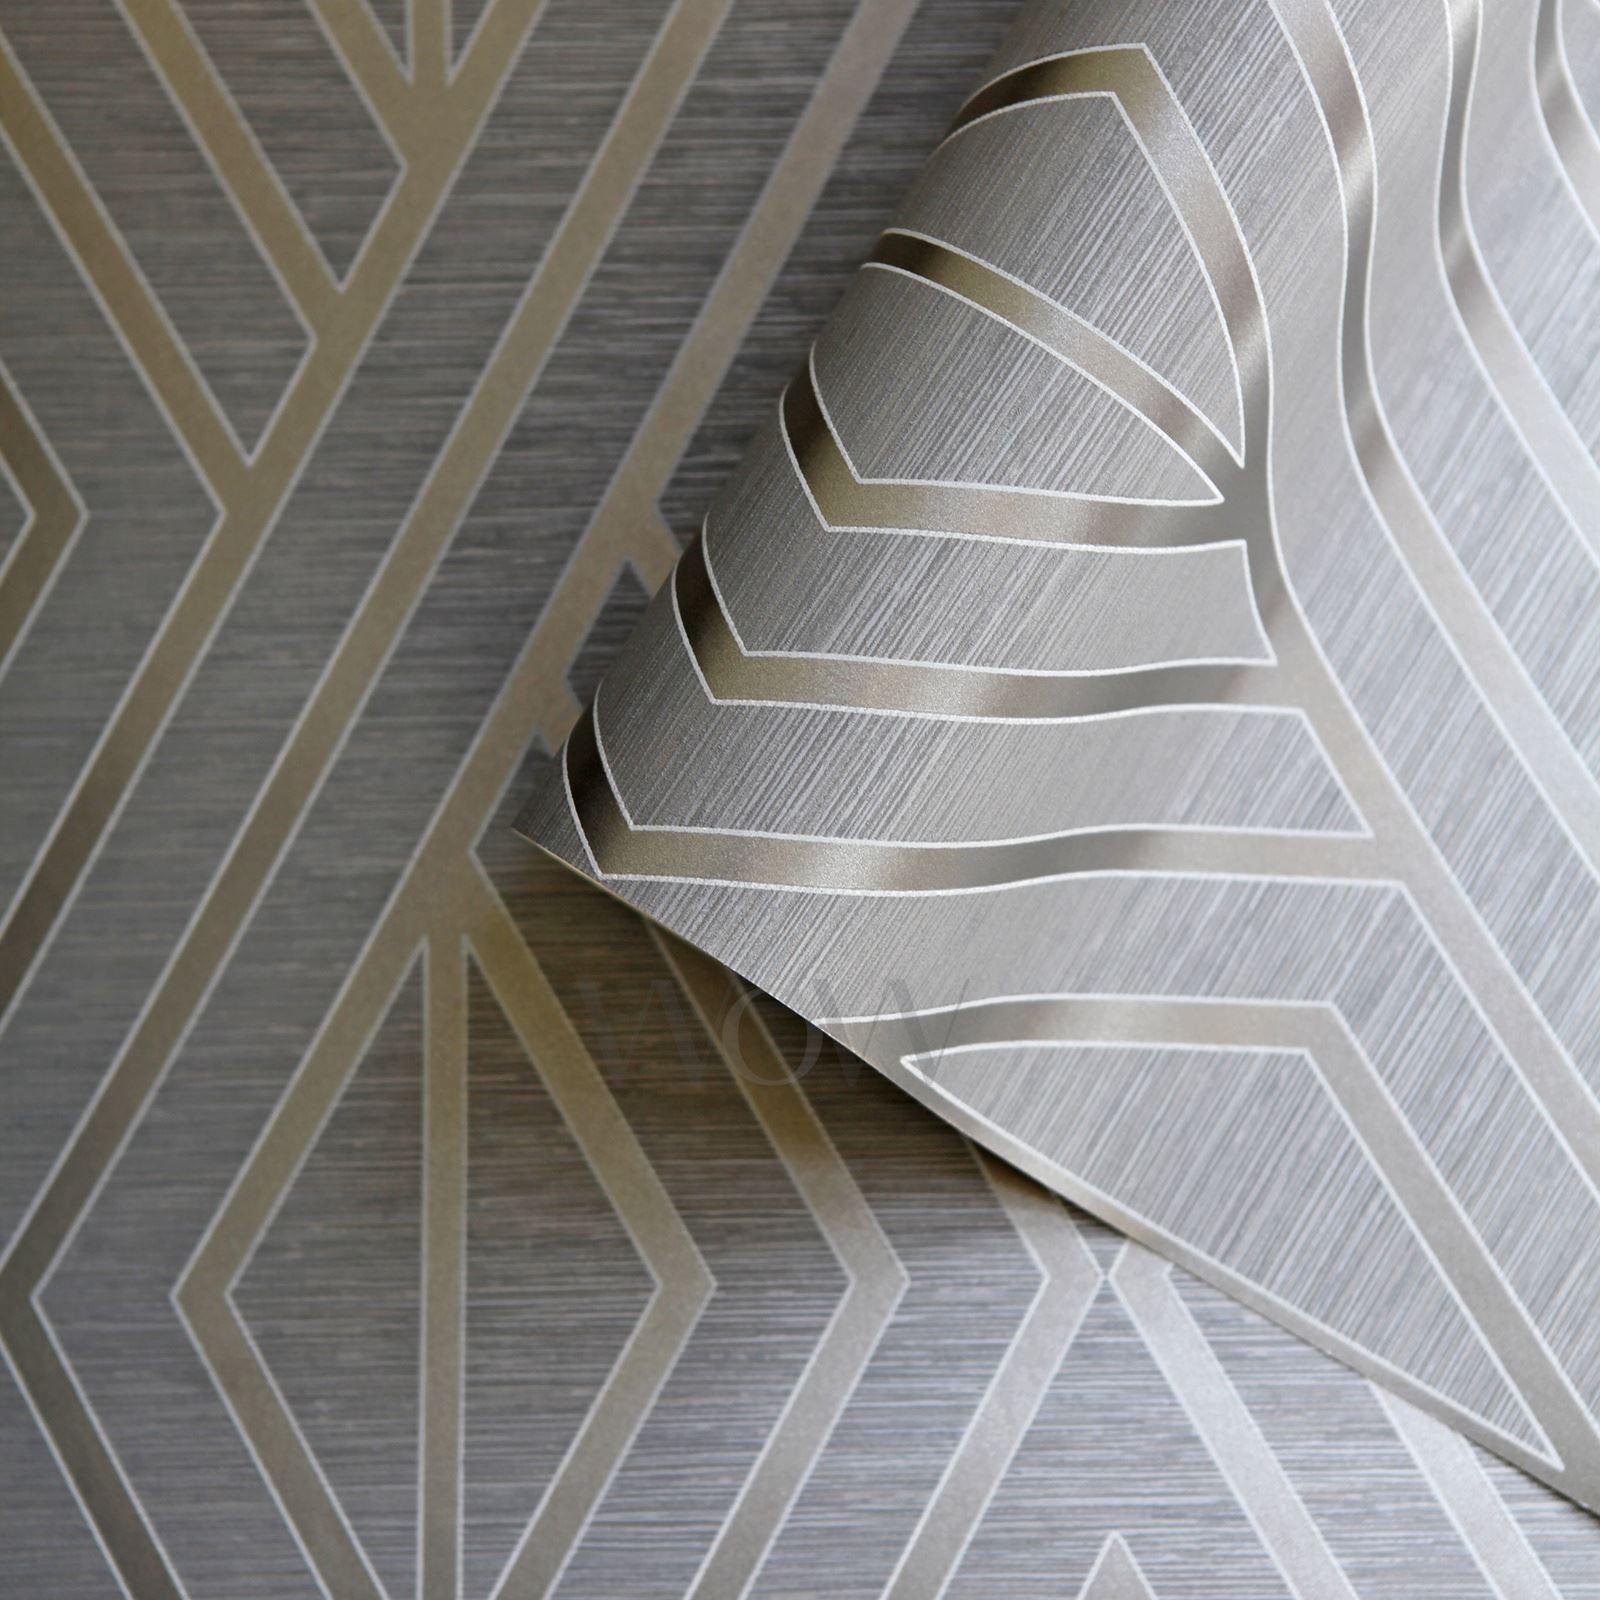 Carta da parati geometrica grigio argento pera albero for Carta parati argento